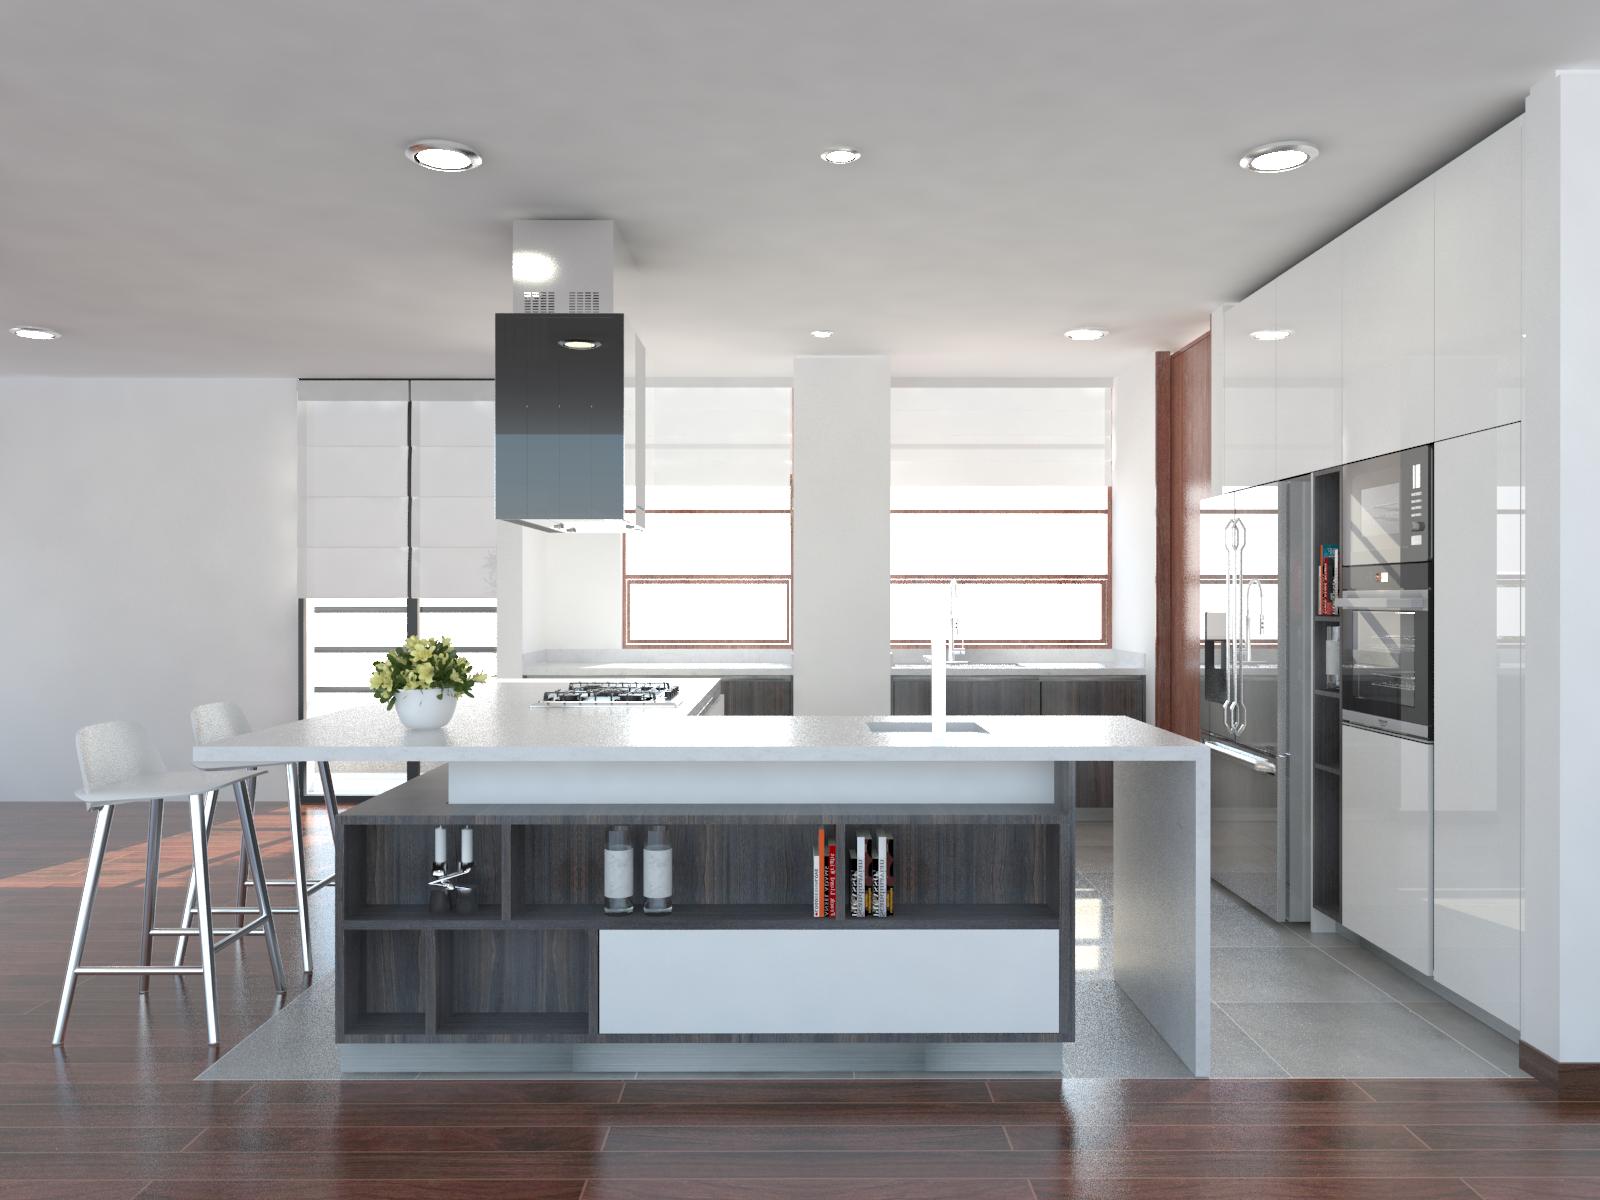 Cocinas modernas |Bogotá |Cali |Ibagué | Fanáticos por las cocinas